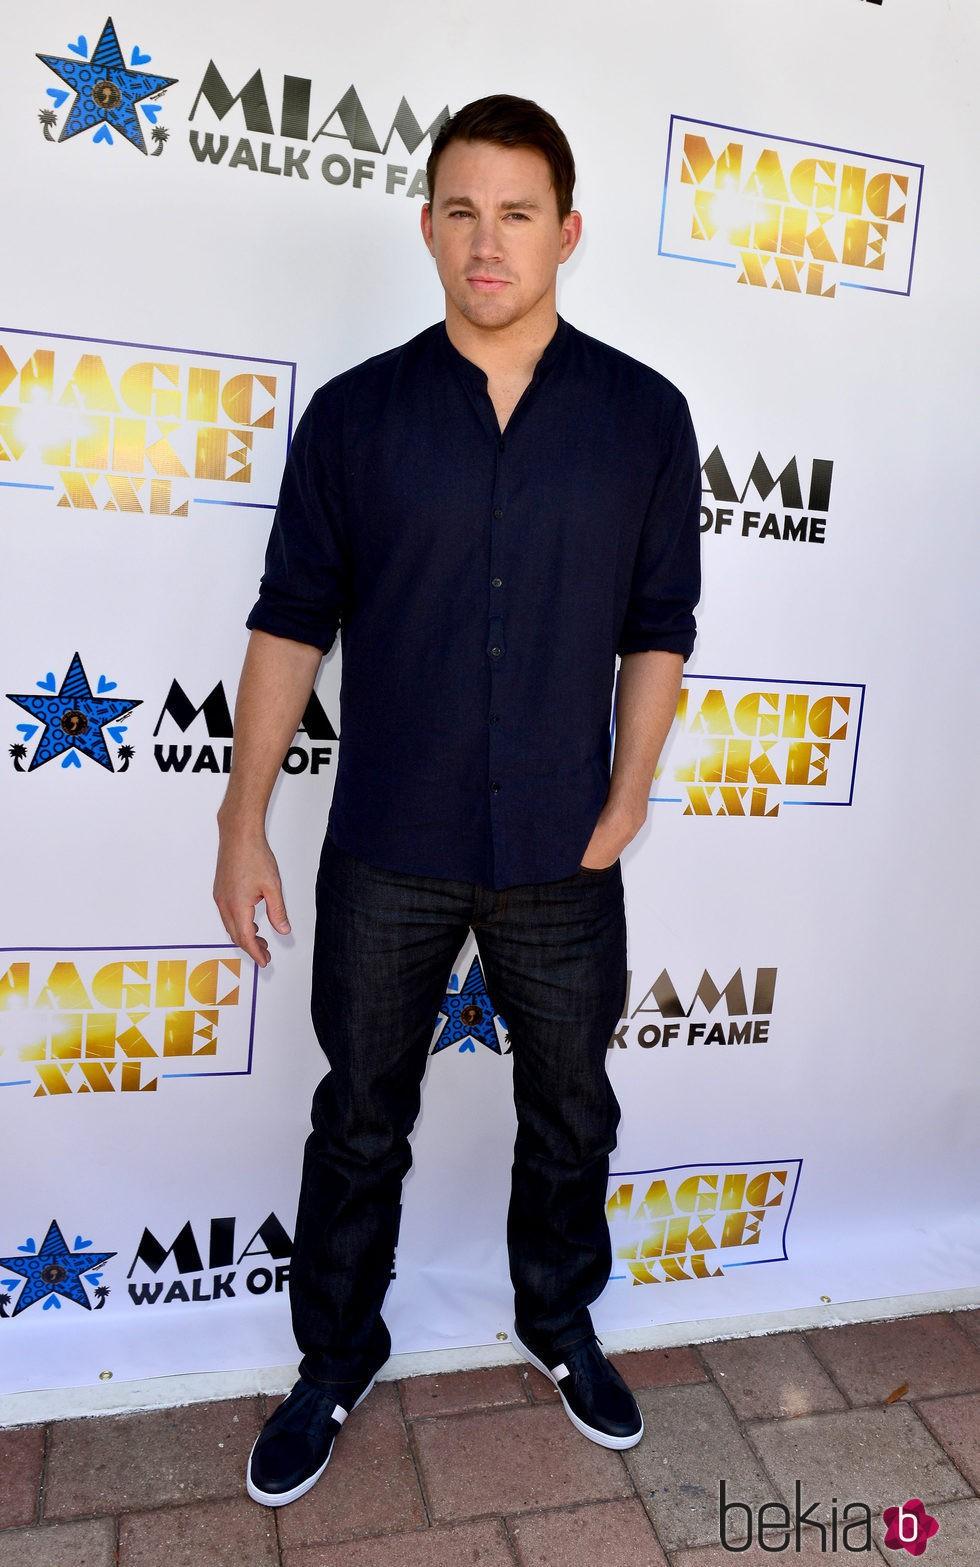 Channing Tatum en el Paseo de la Fama de Miami